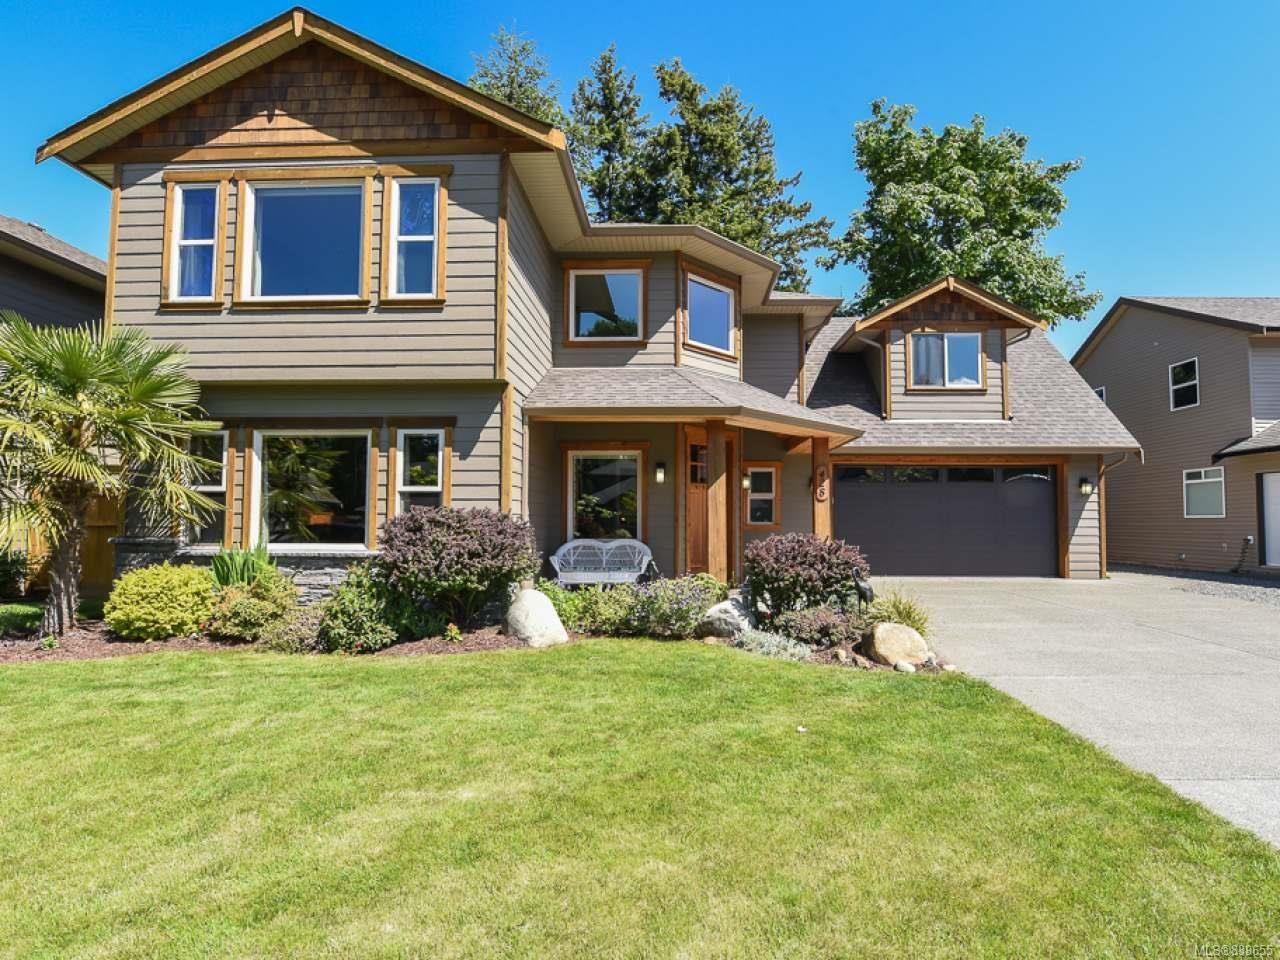 Main Photo: 428 Ensign St in COMOX: CV Comox (Town of) House for sale (Comox Valley)  : MLS®# 839655